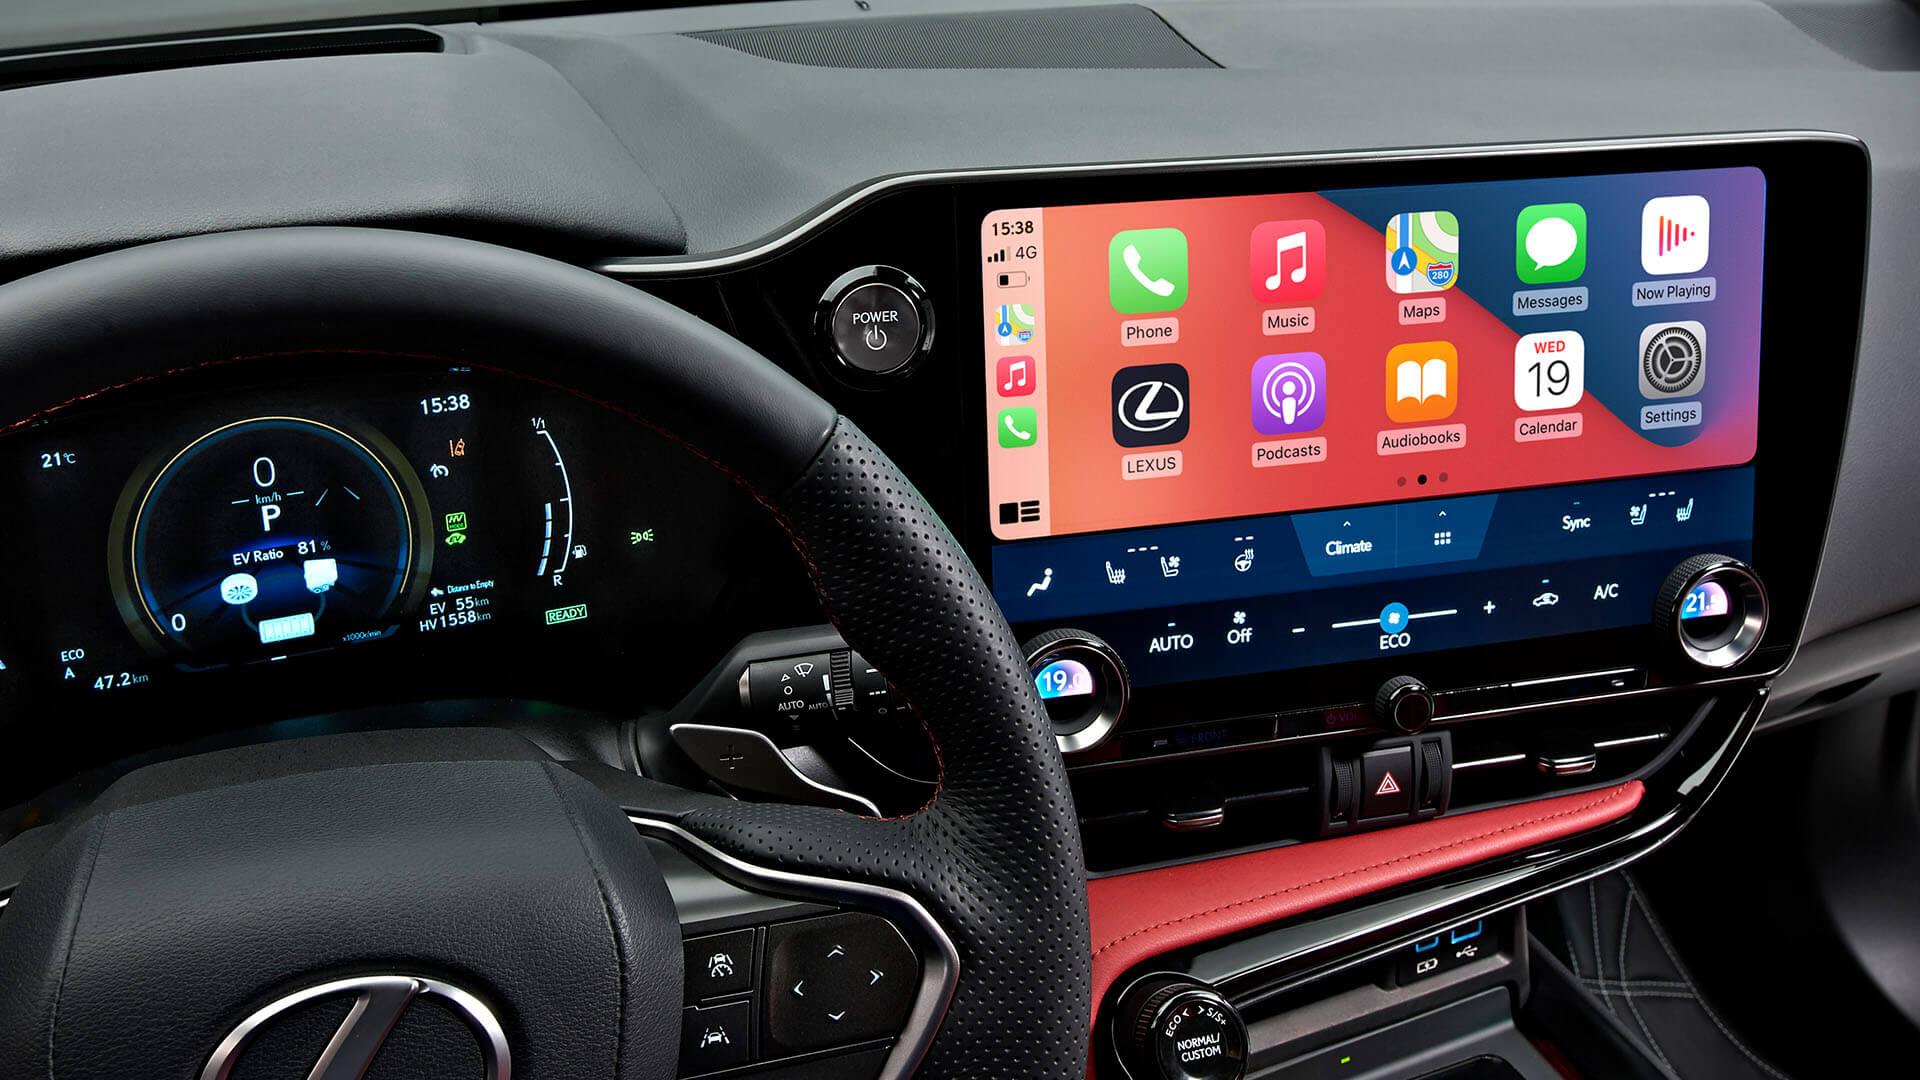 2021 lexus nx experience interior front smartphone integration